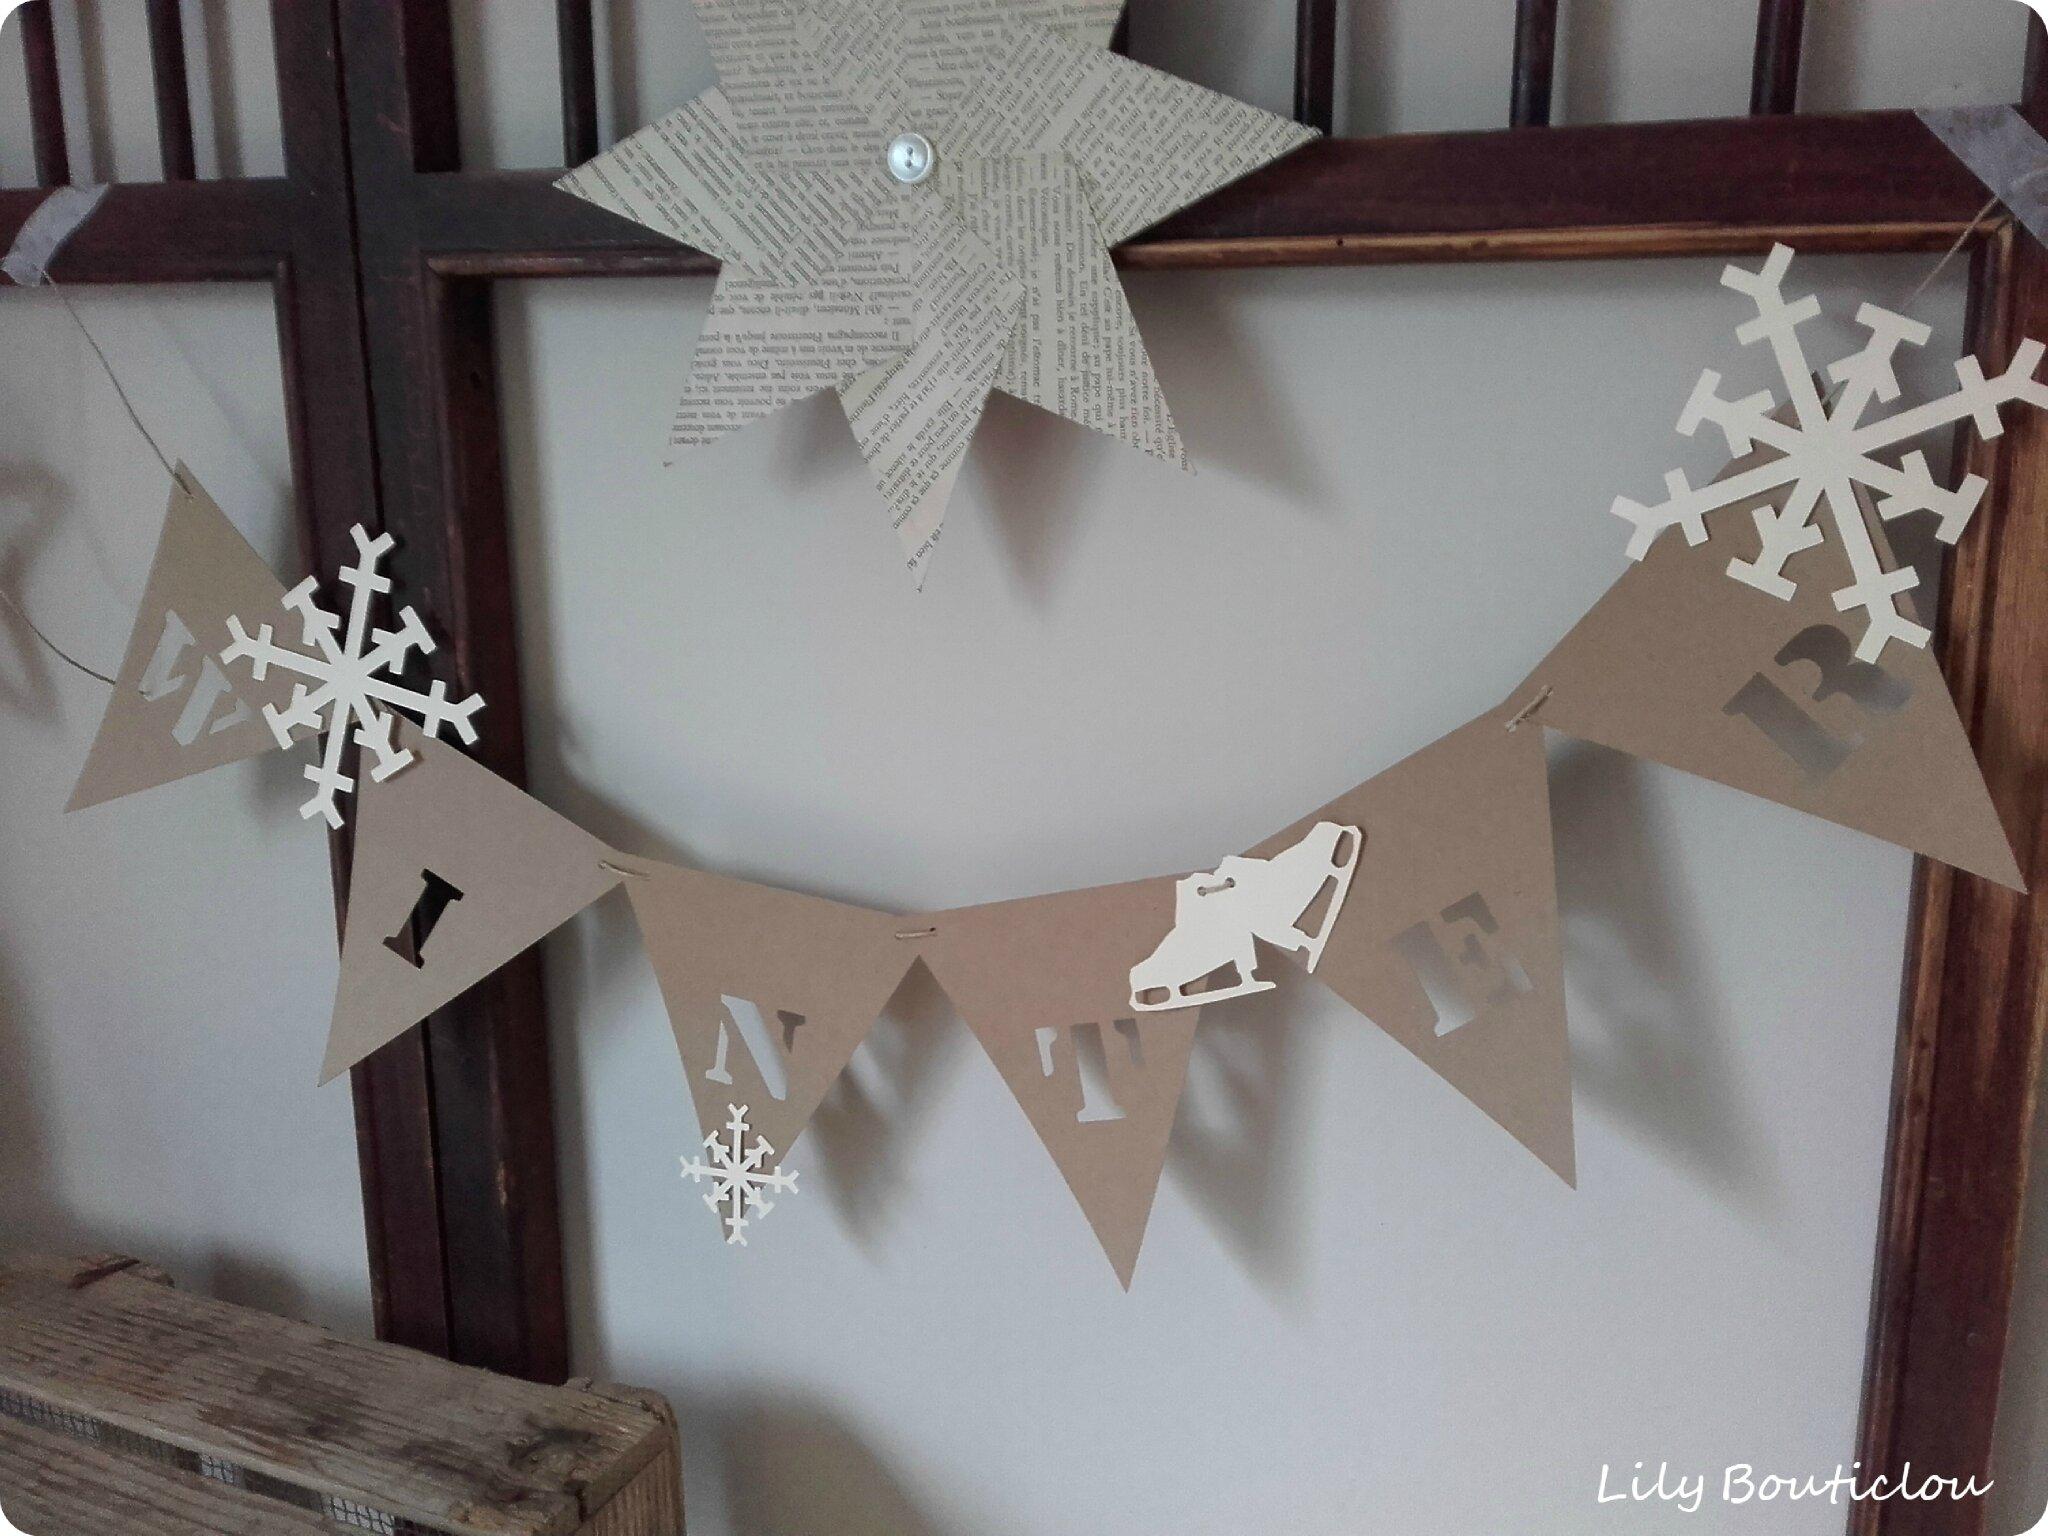 guirlande fanions carton pennant garland cardboard lilybouticlou